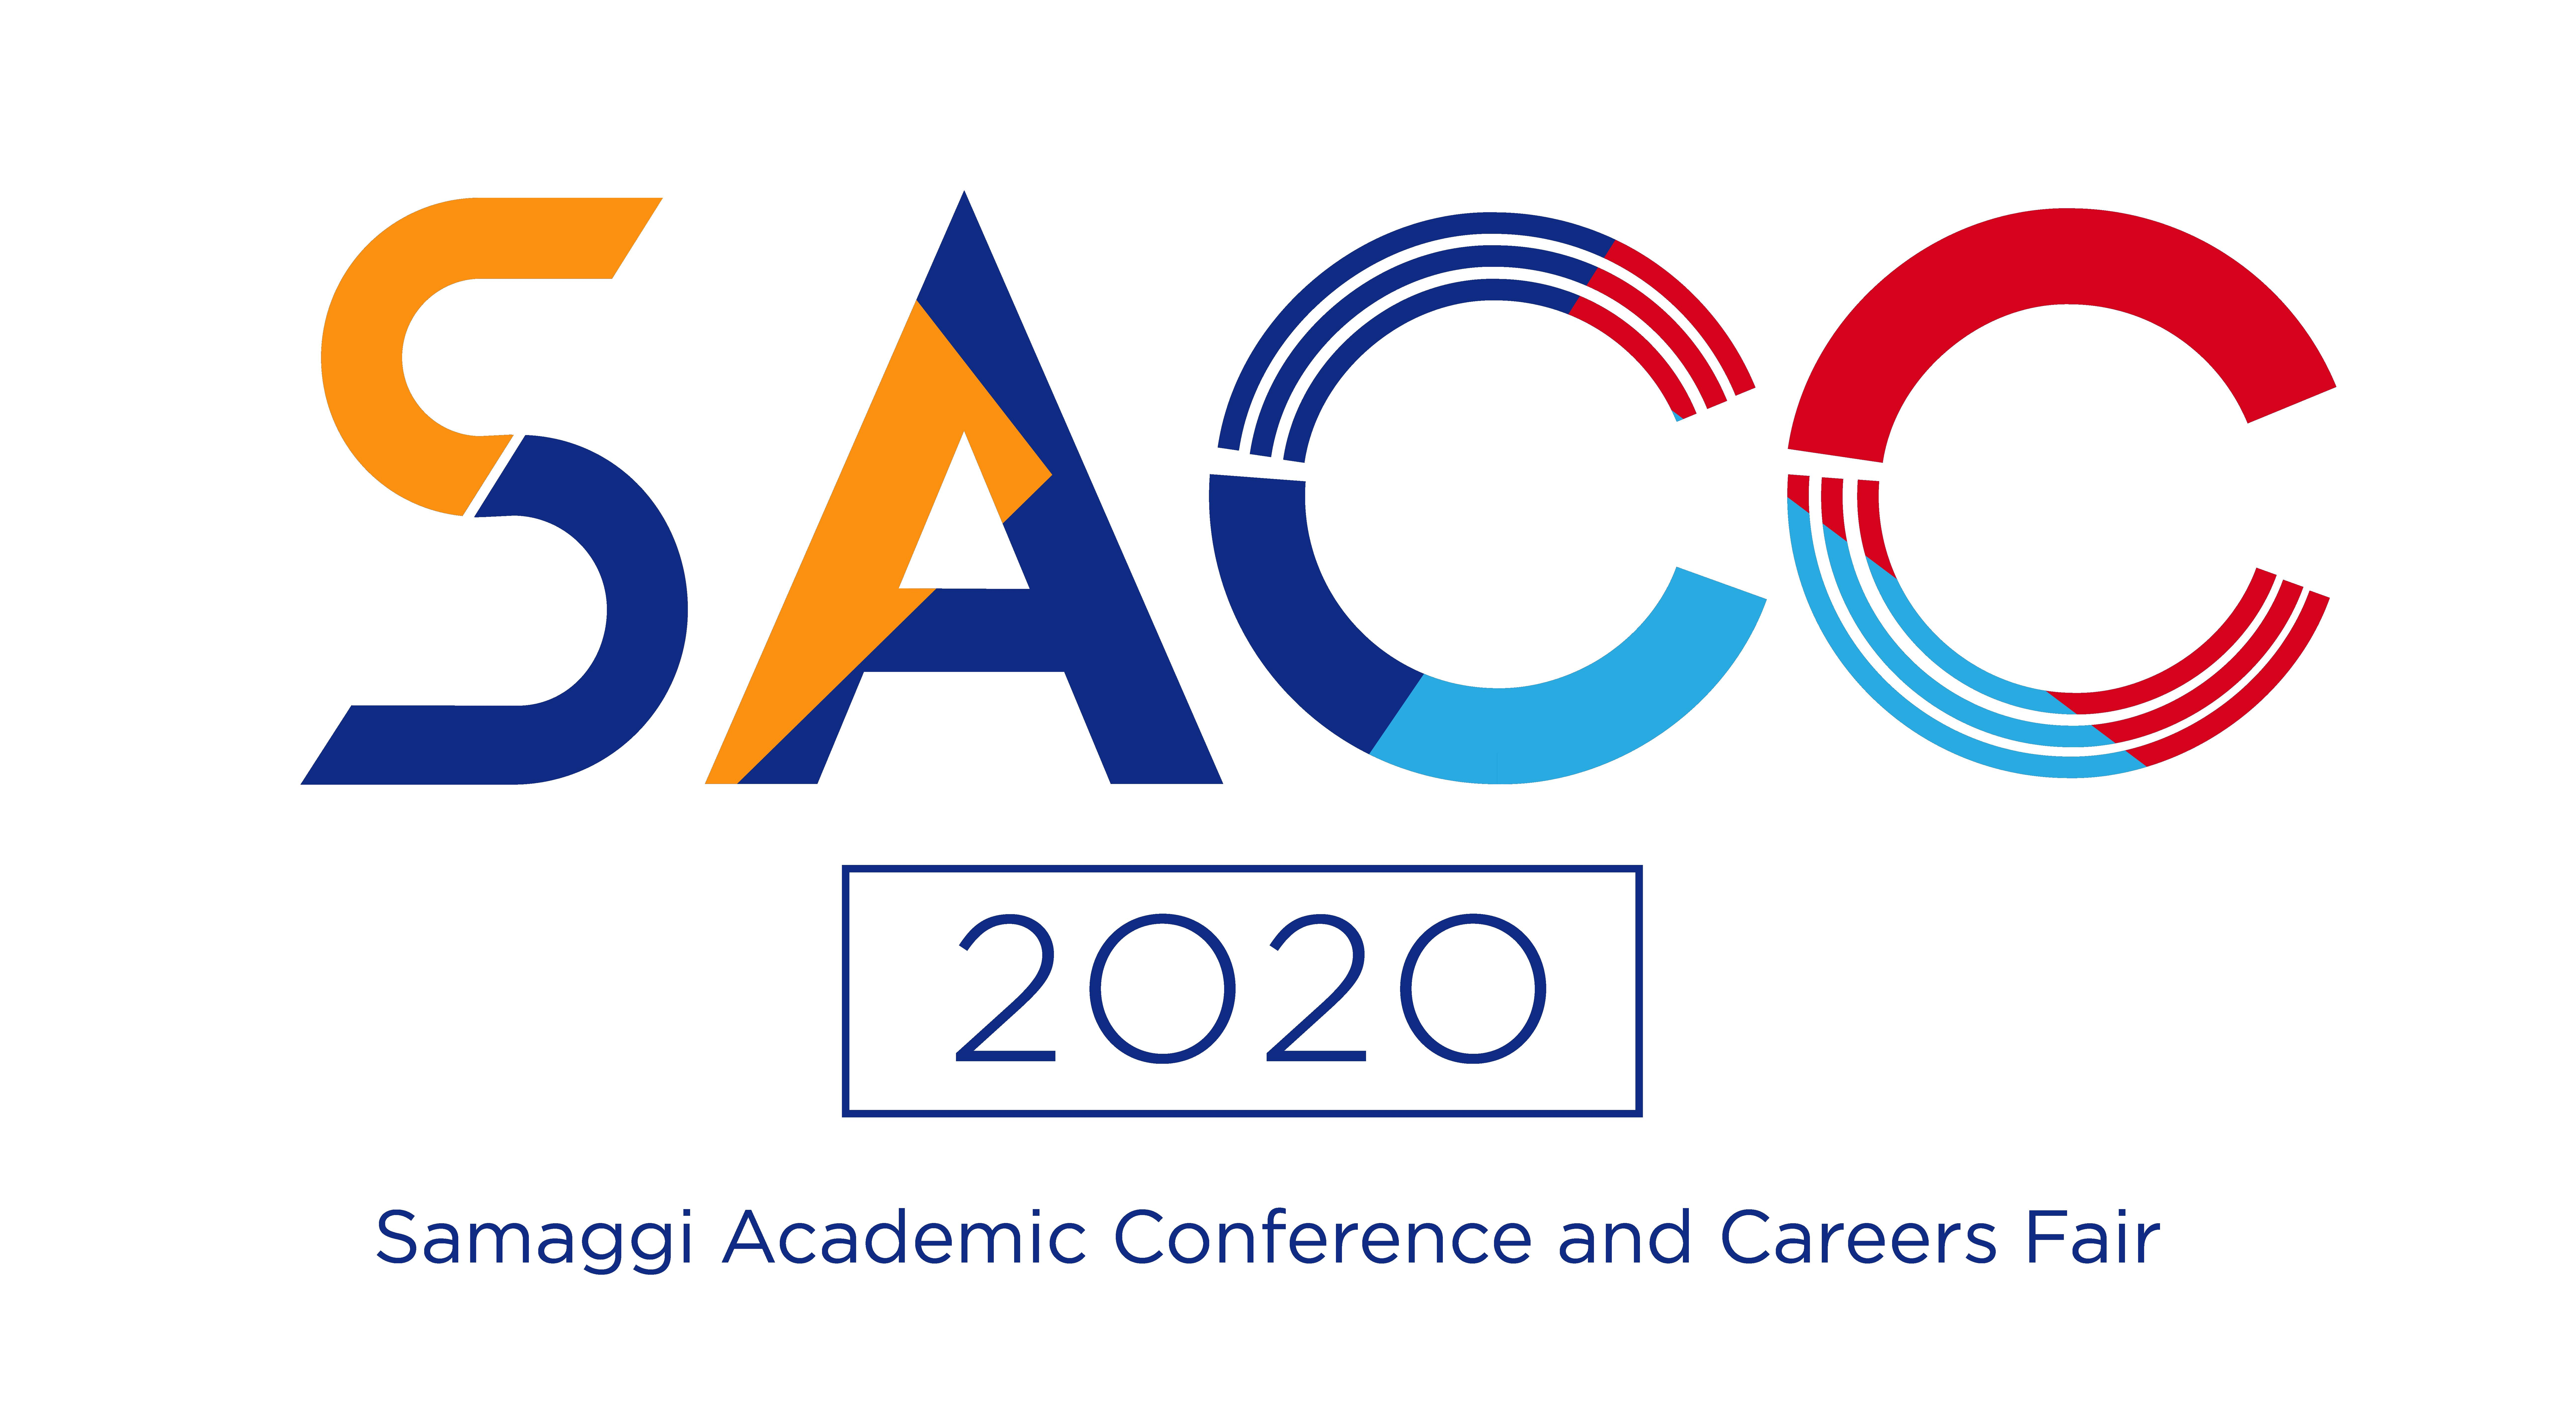 SACC SS19 logo